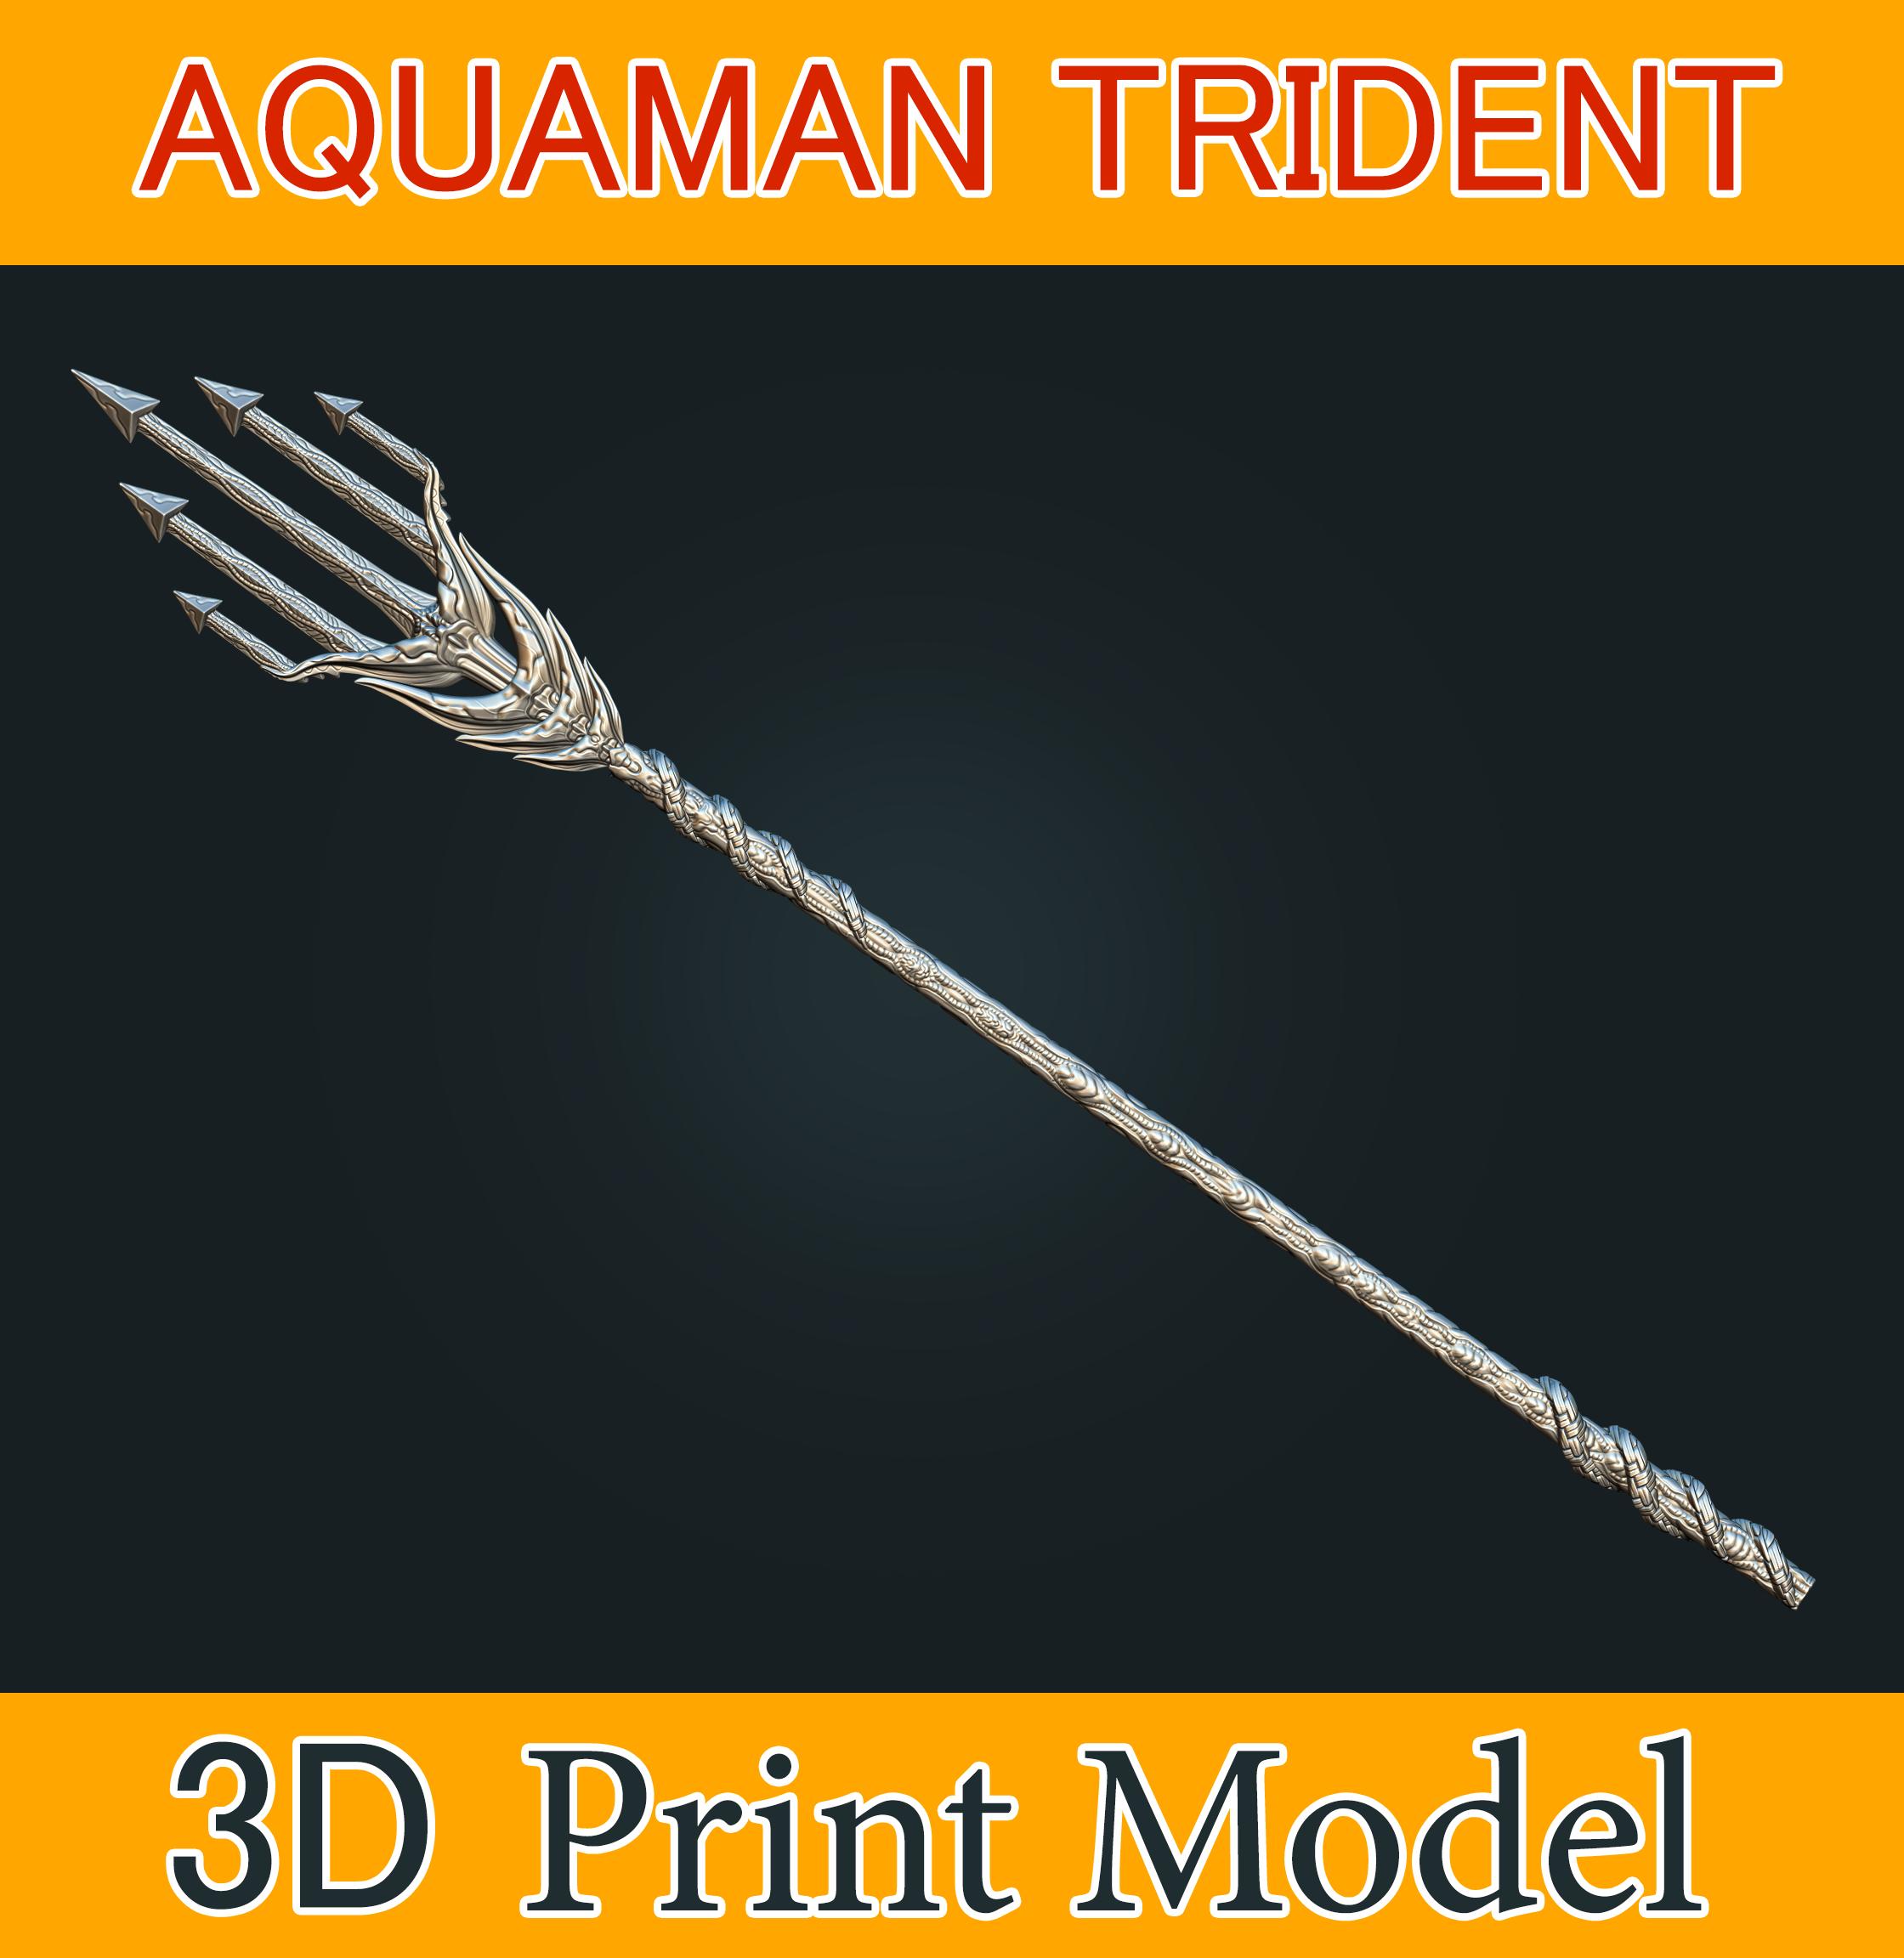 aquaman_weapon_stl_07b.png Download STL file Aquaman Trident Cosplay STL files - Costume Weapons 3D Printing • 3D printing design, 3DPrintModelStoreSS